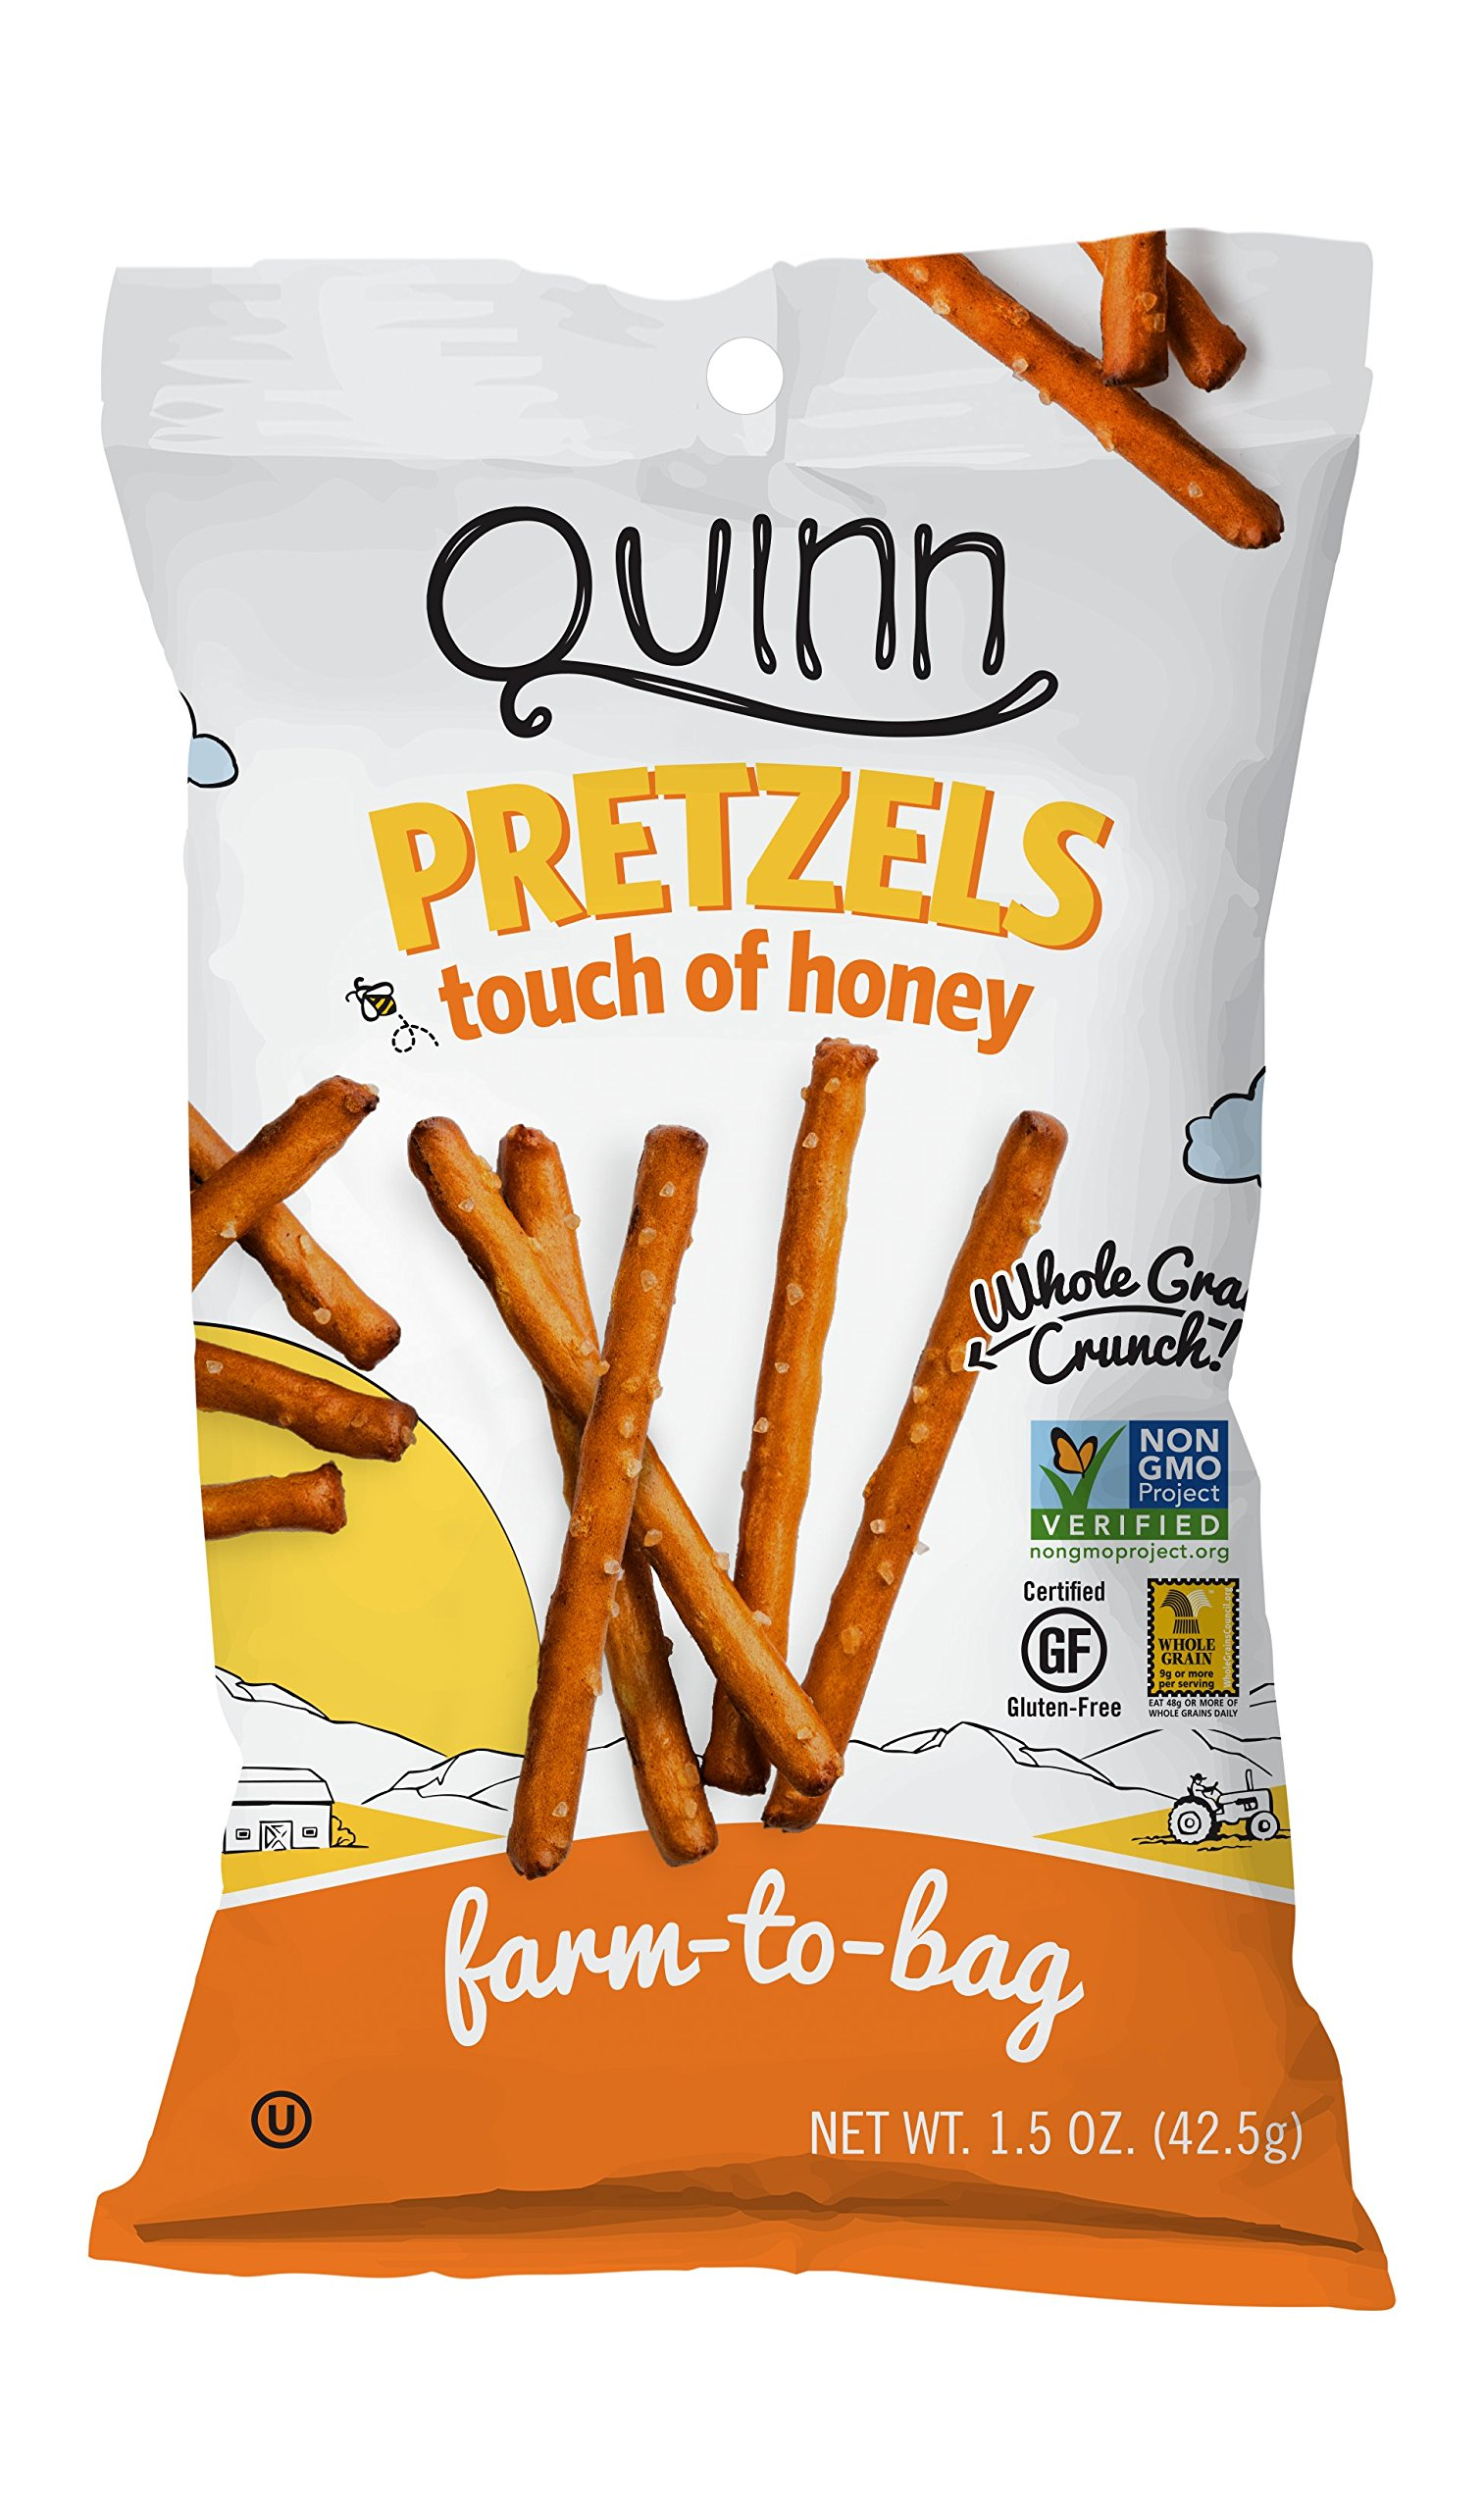 Quinn Pretzel Snack Bags (36 pack) Whole Grain, Gluten Free and Non-GMO - Honey 1.5oz bags by Quinn Snacks